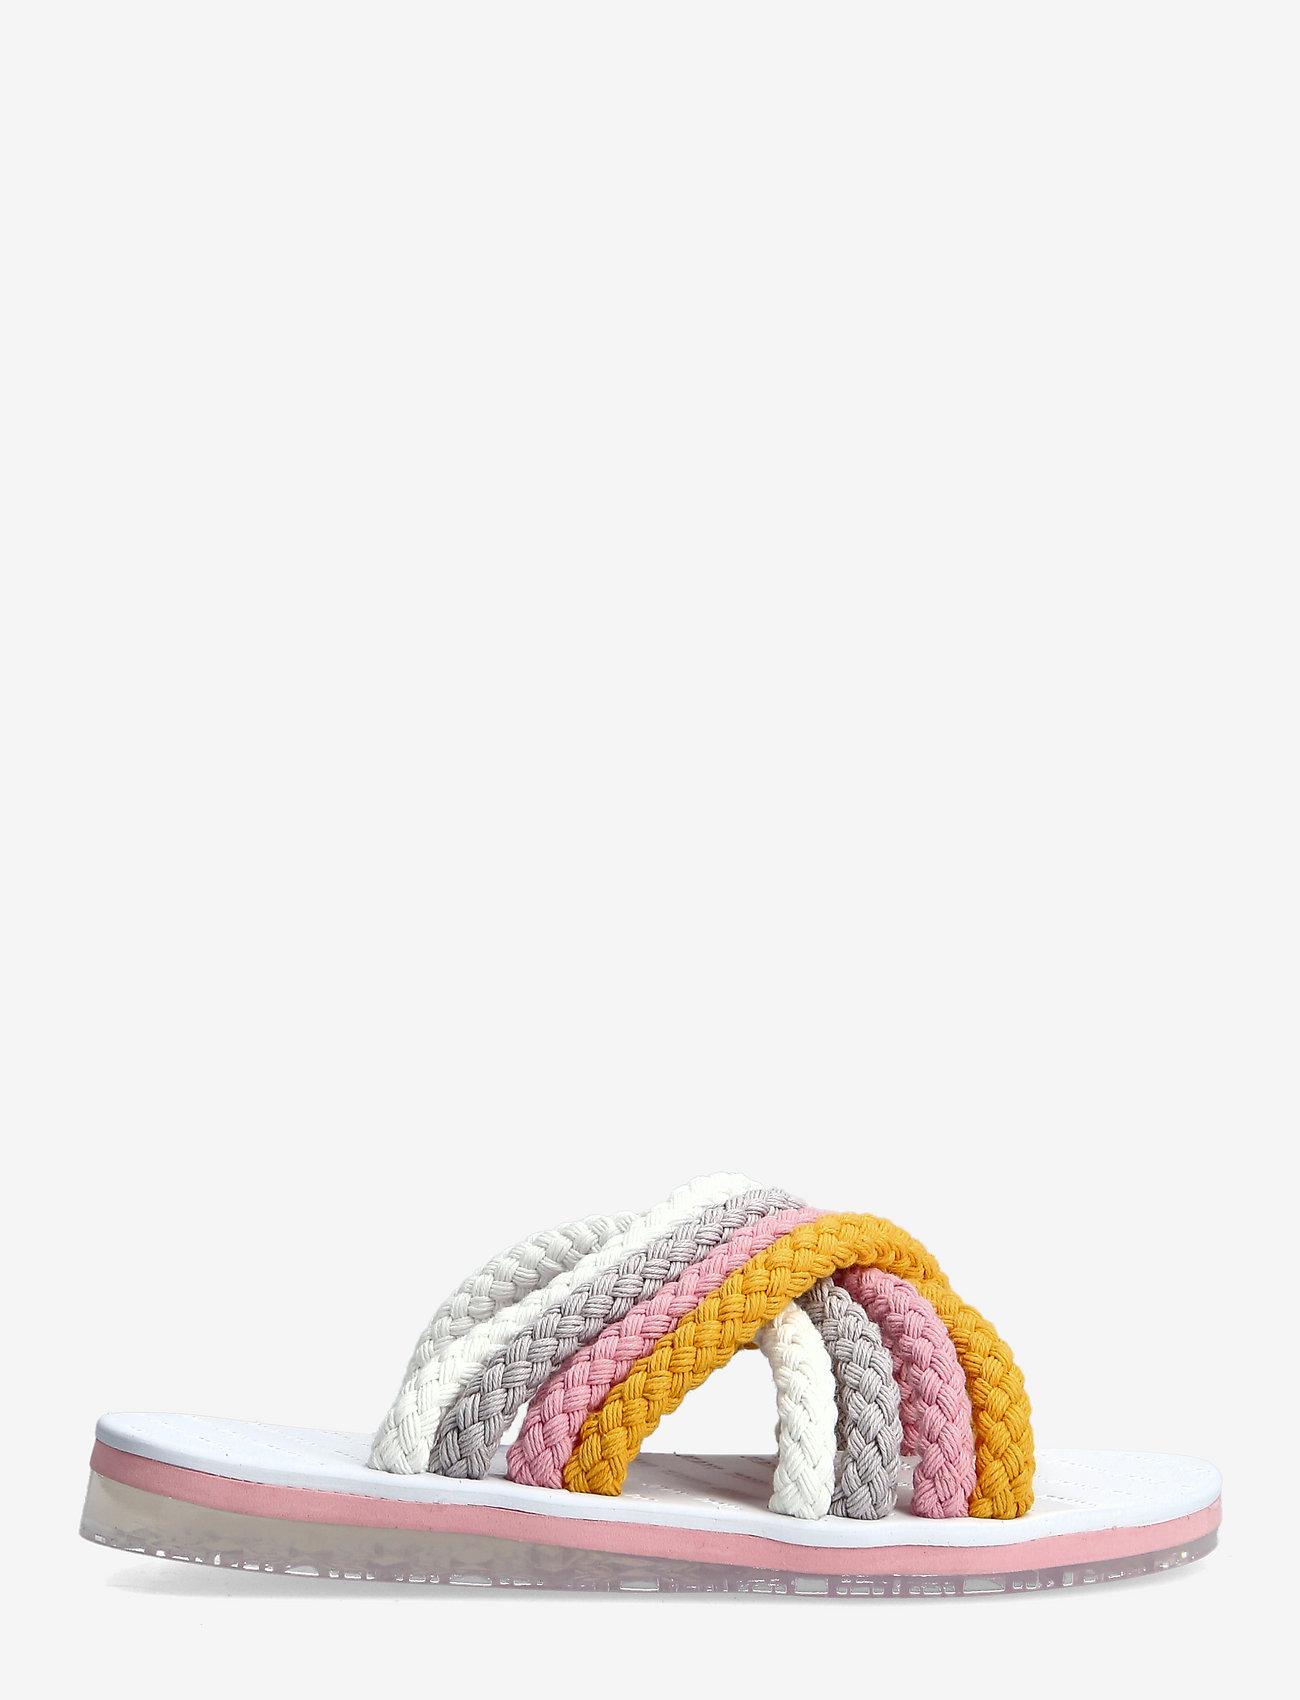 Tommy Hilfiger - CROSS STRAP MULE SANDAL - flat sandals - white - 1